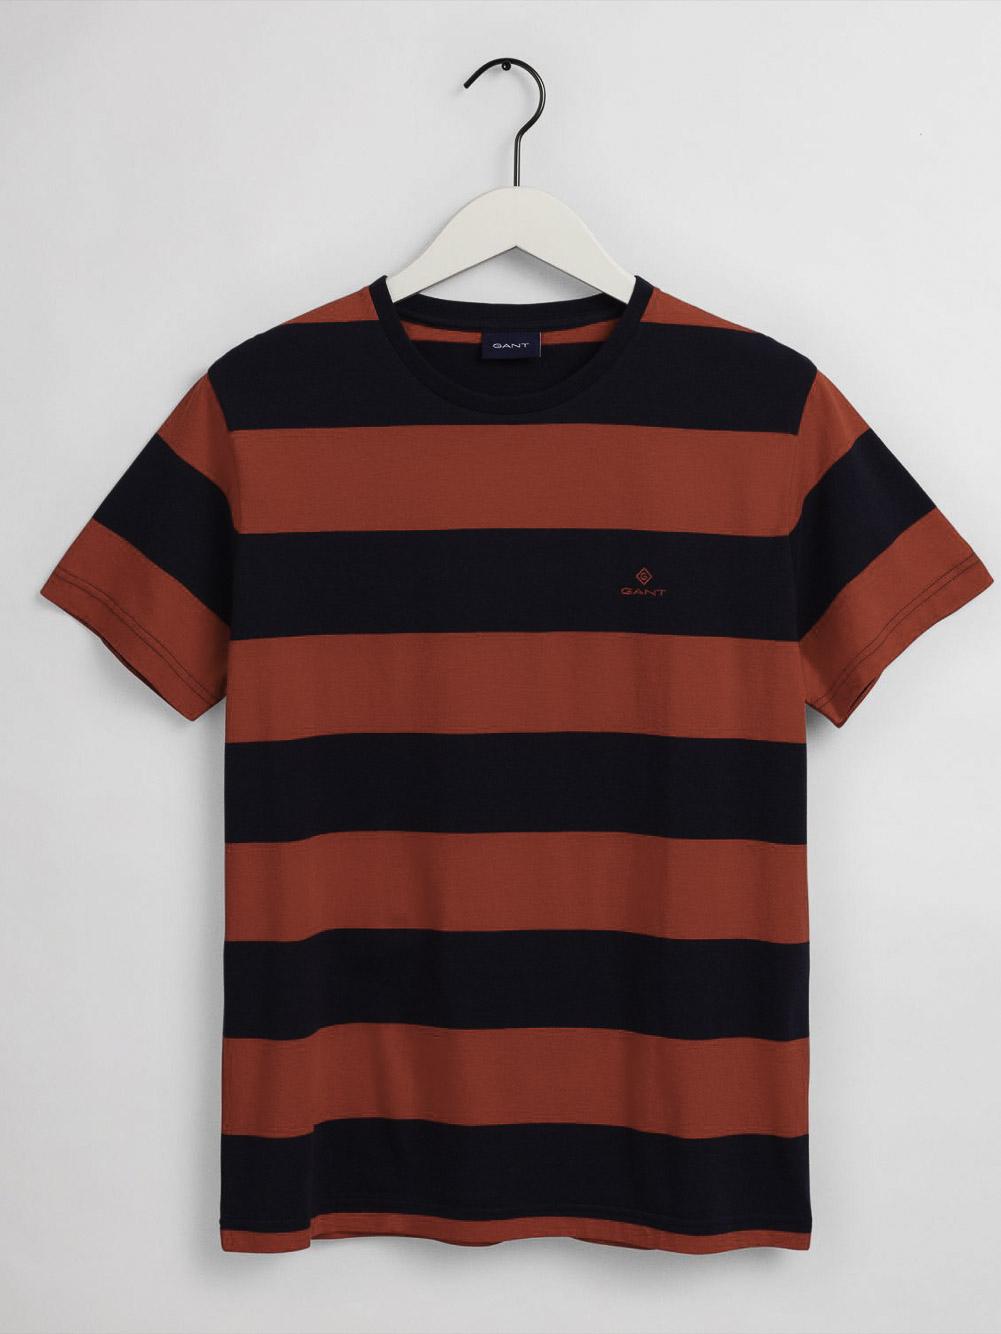 GANT Mπλούζα t-shirt 3G2003008-620 ΑΝΟΙΧΤΟ ΚΟΚΚΙΝΟ